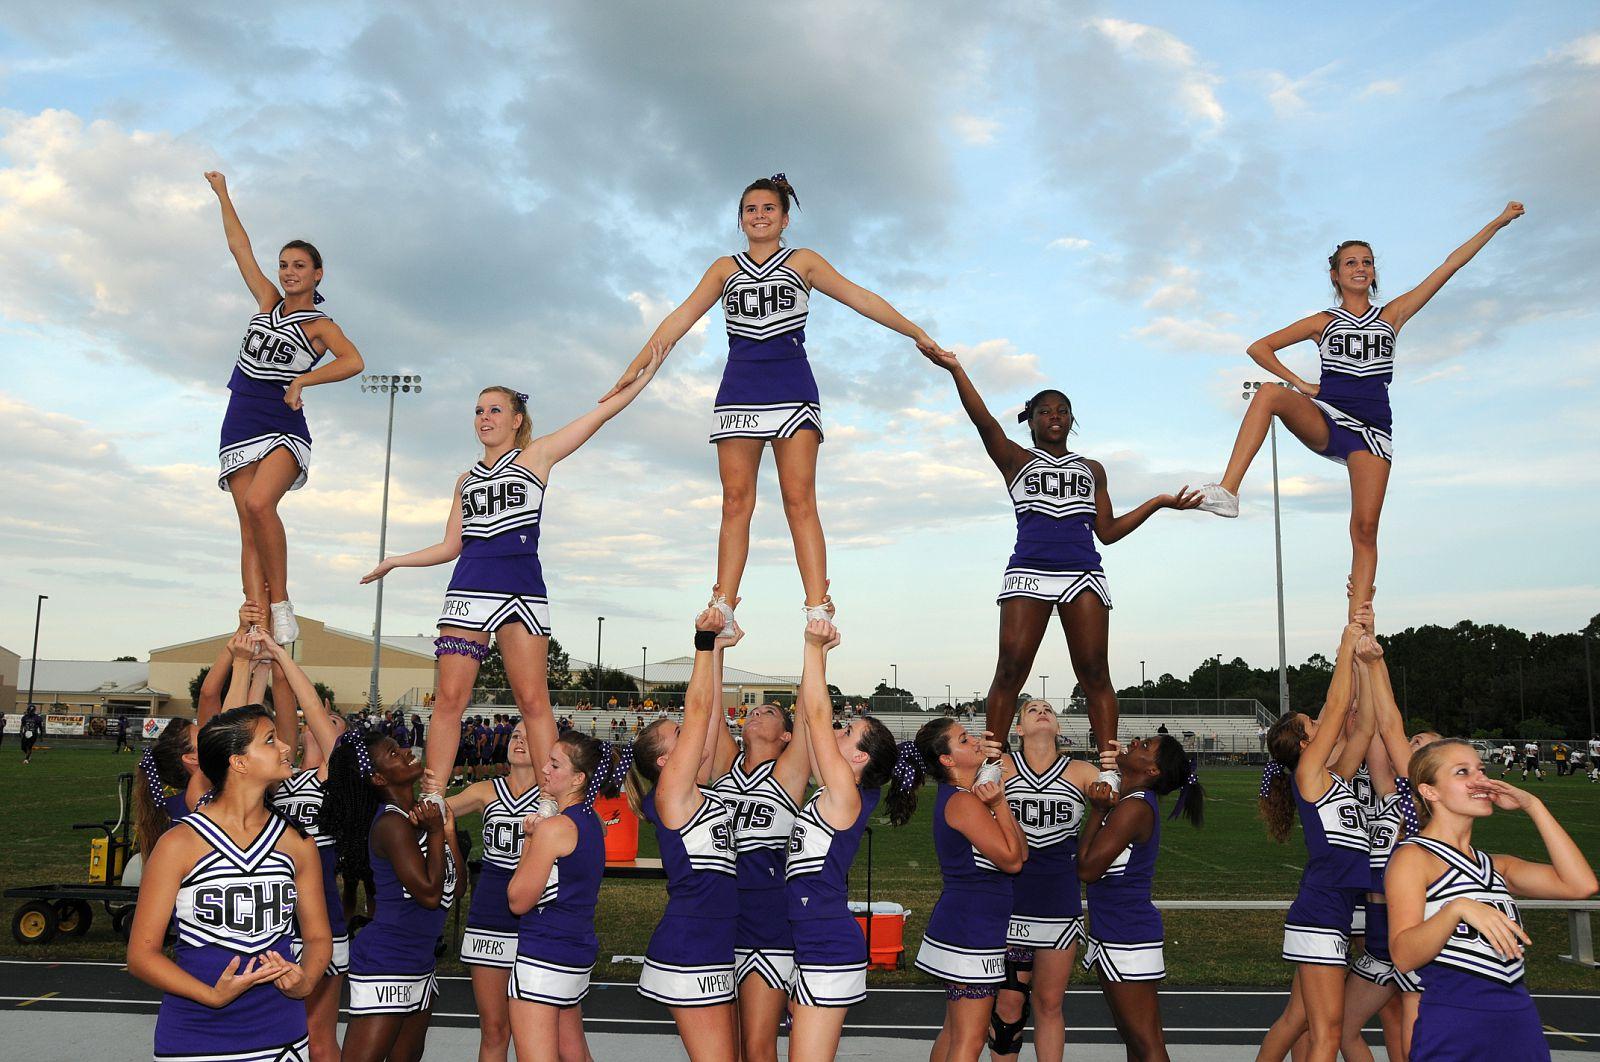 Girls High School Cheerleading Stunts